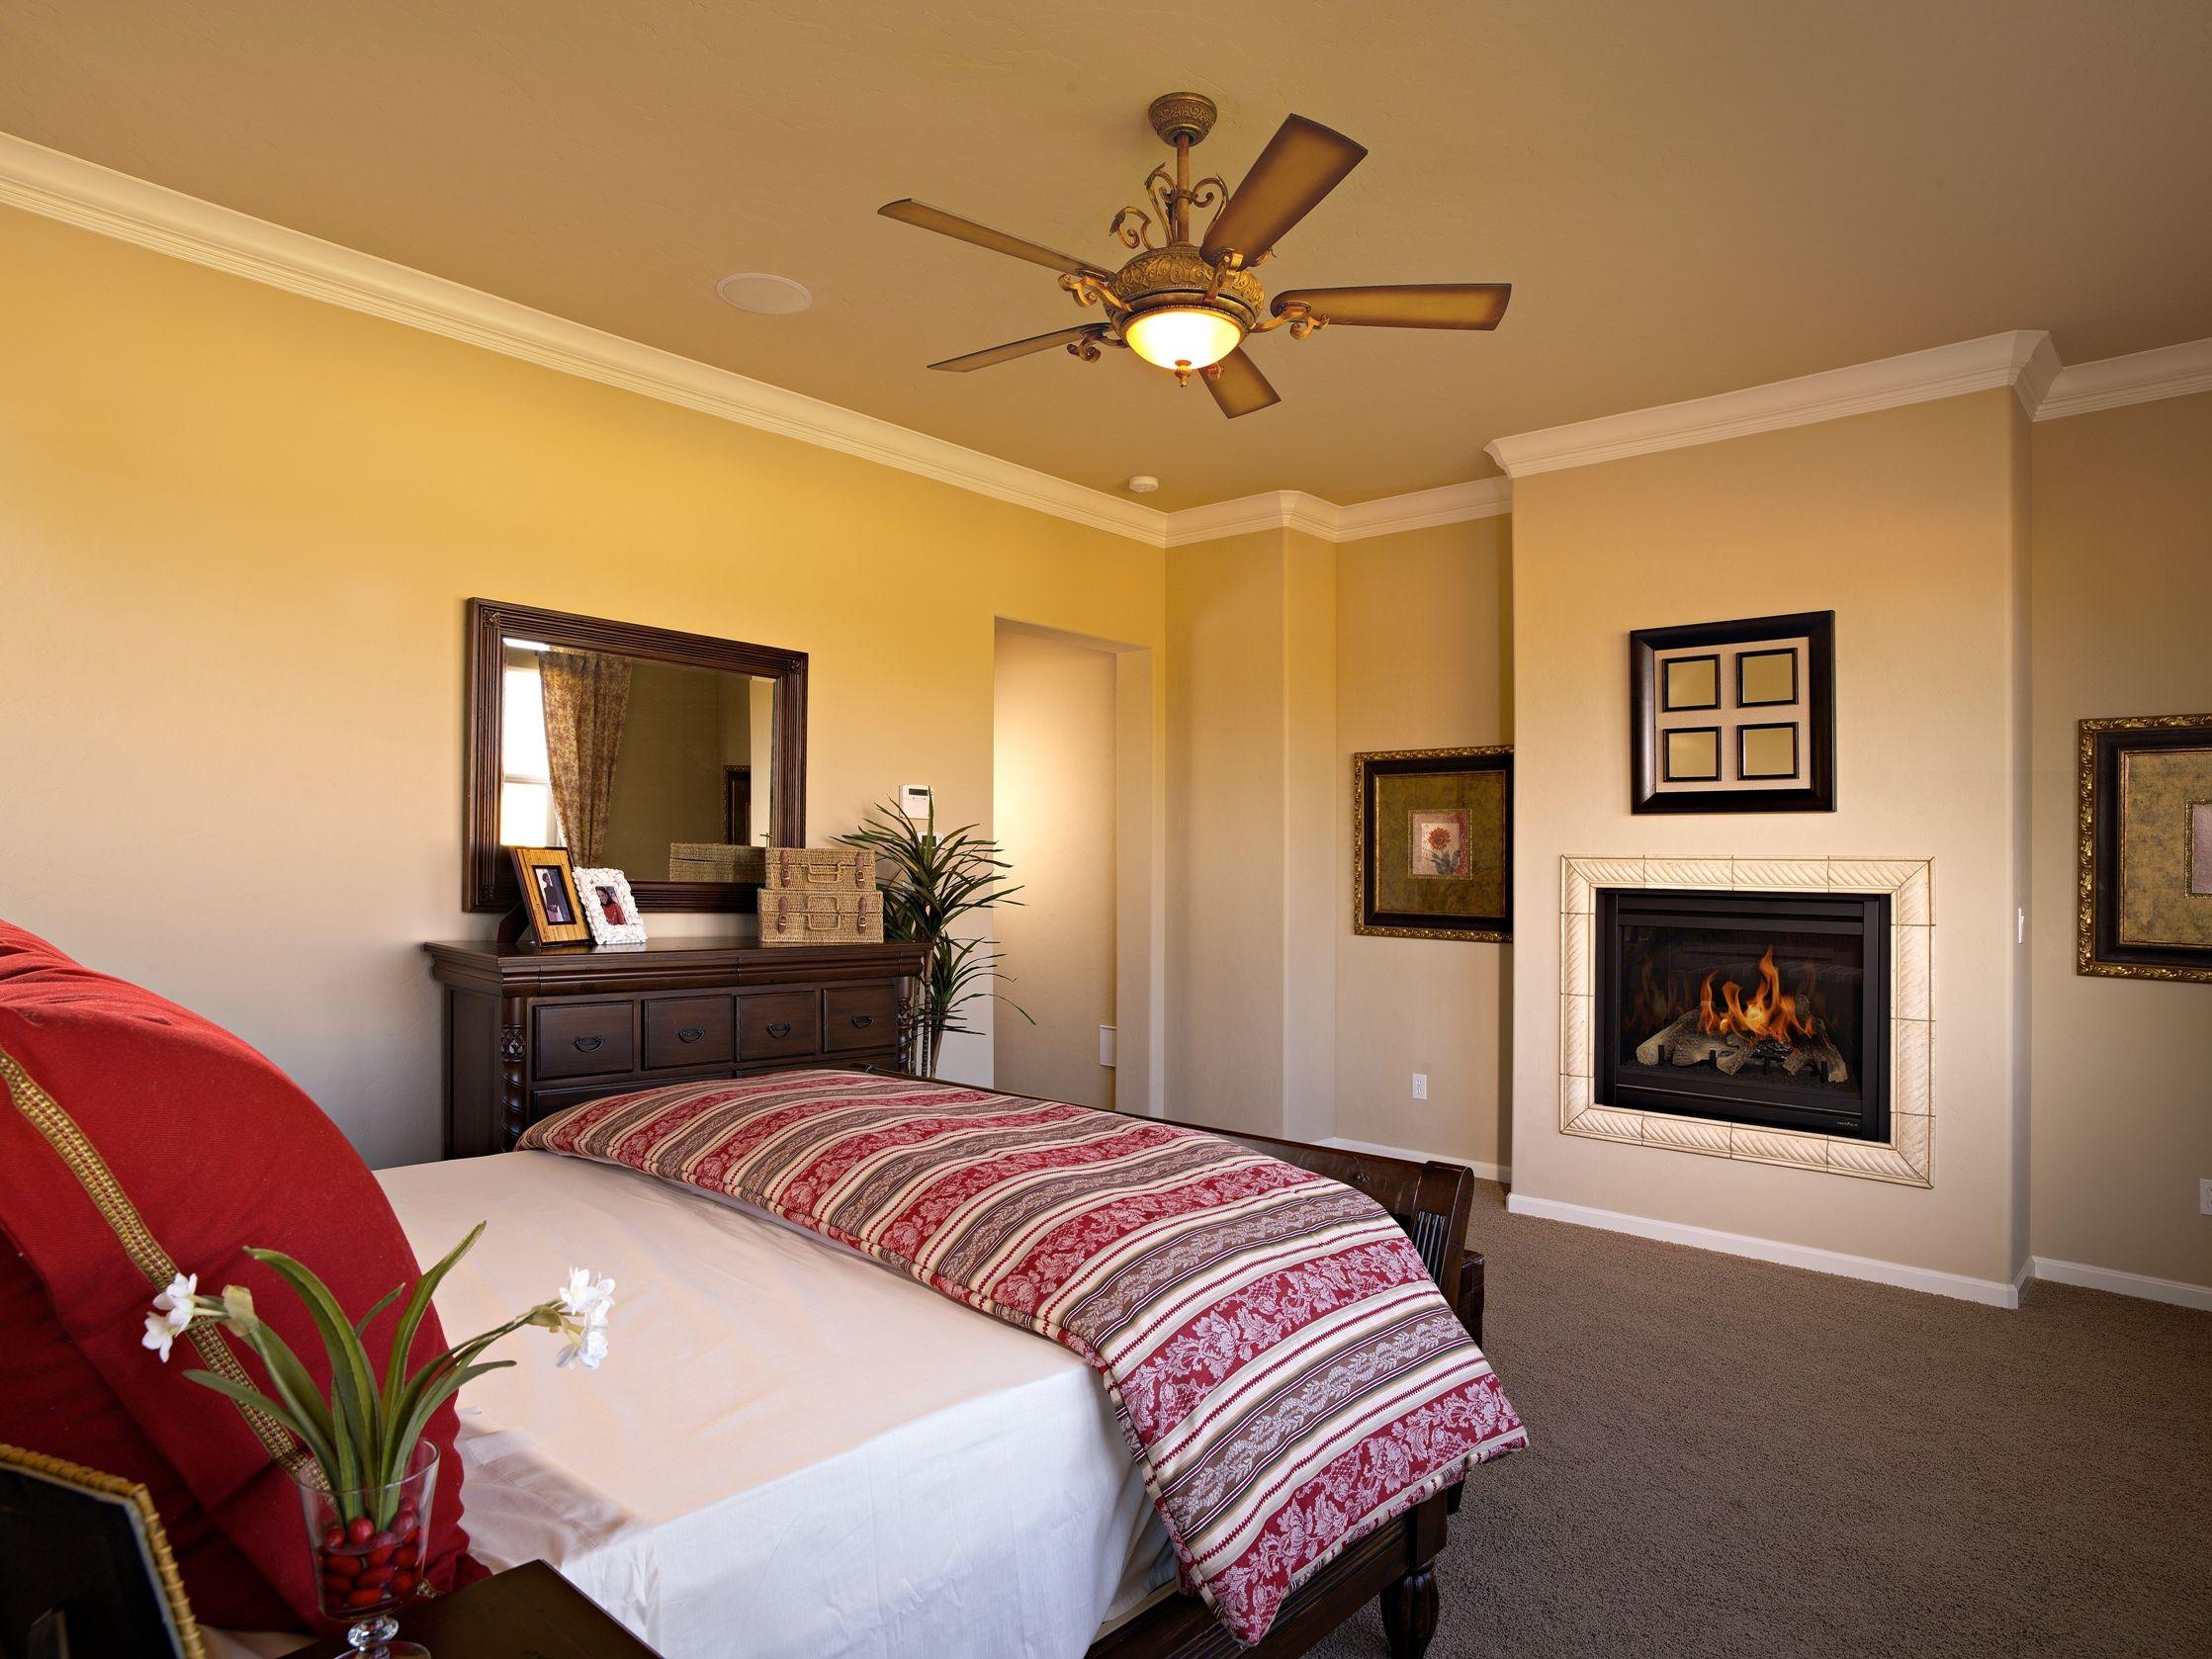 The Residence 240 Master Bedroom | Model homes, Residences ... on Model Bedroom Design  id=14384